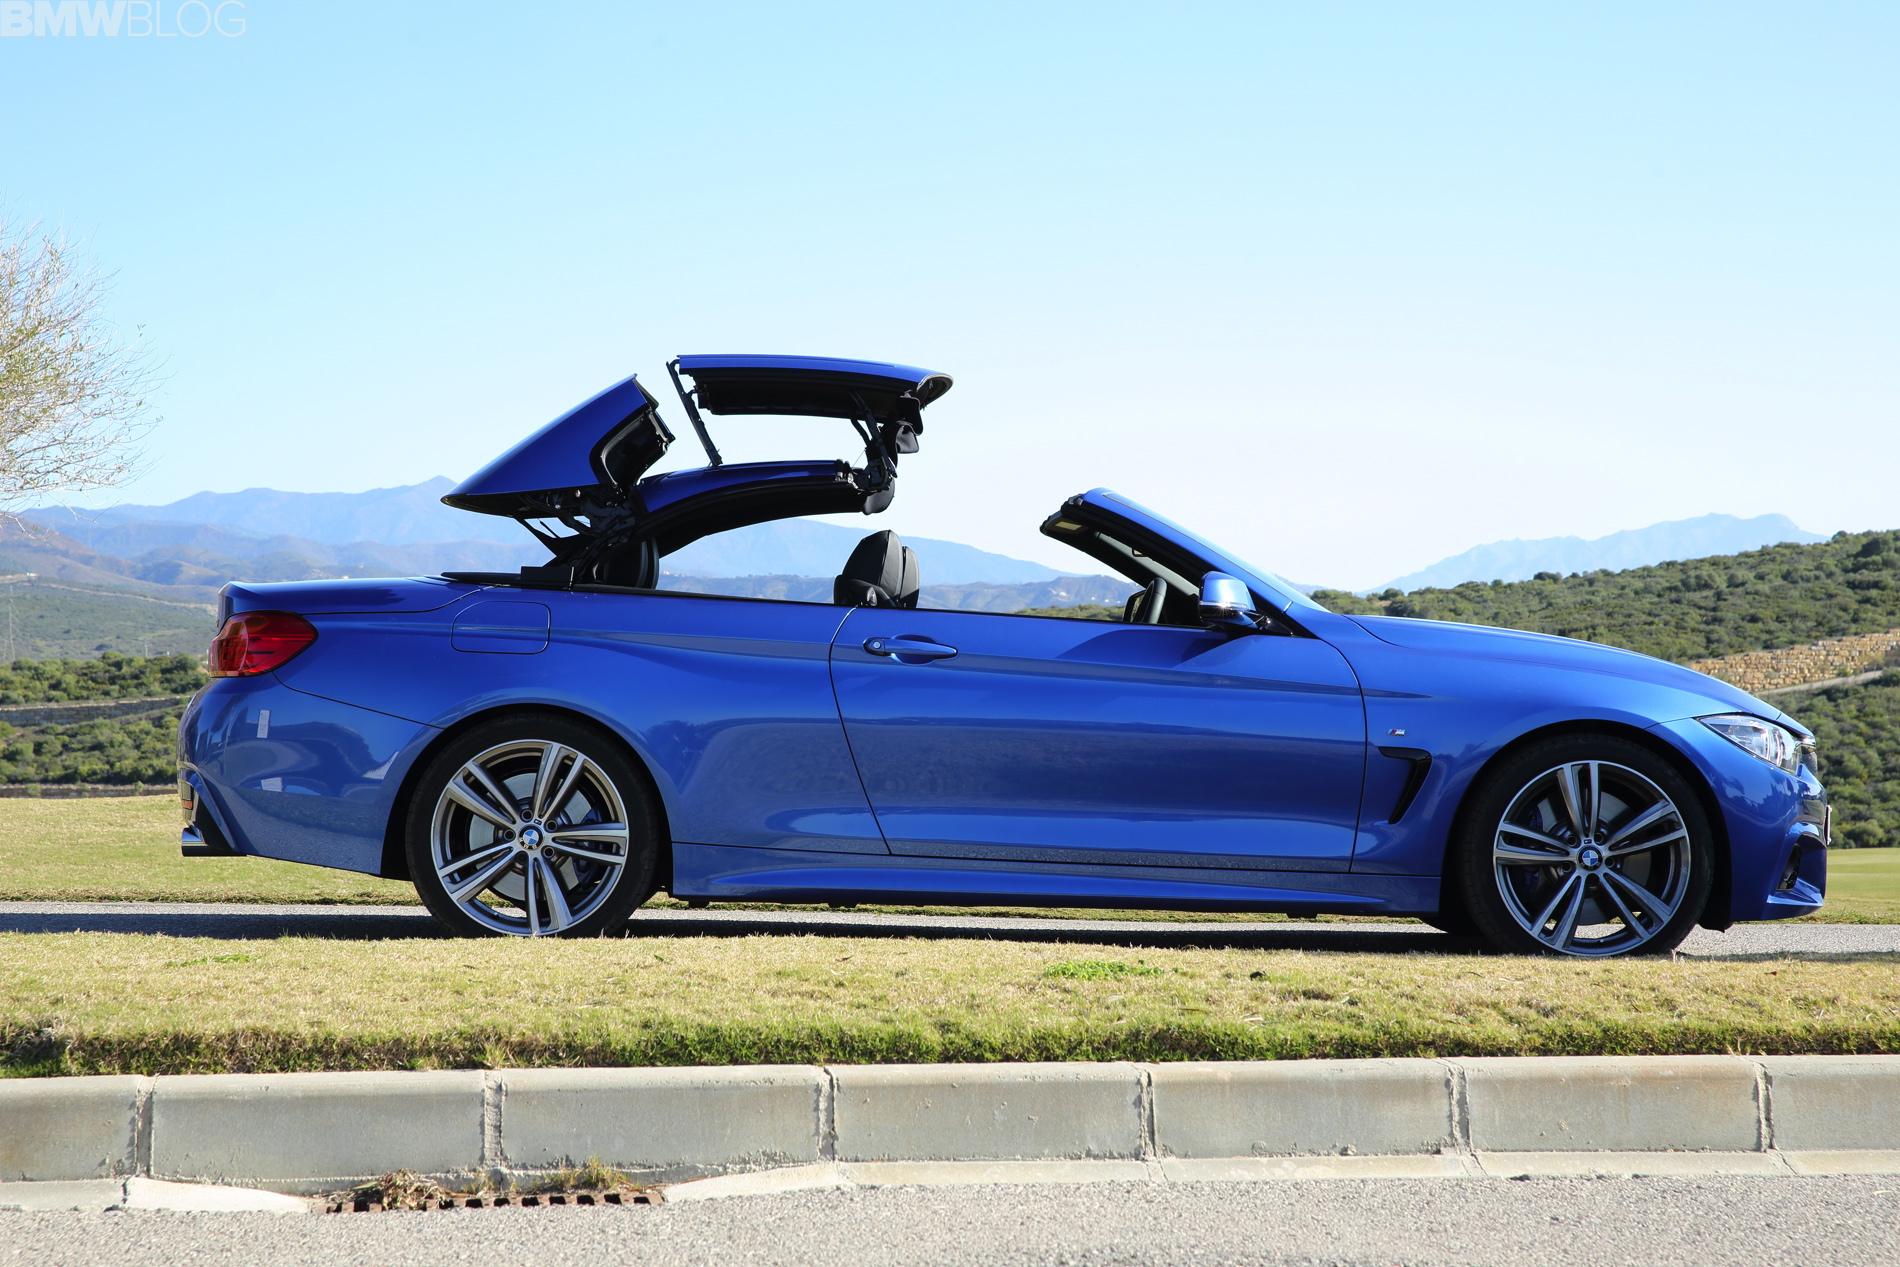 High Resolution Wallpaper | 2014 BMW 4-Series Convertible 1900x1267 px